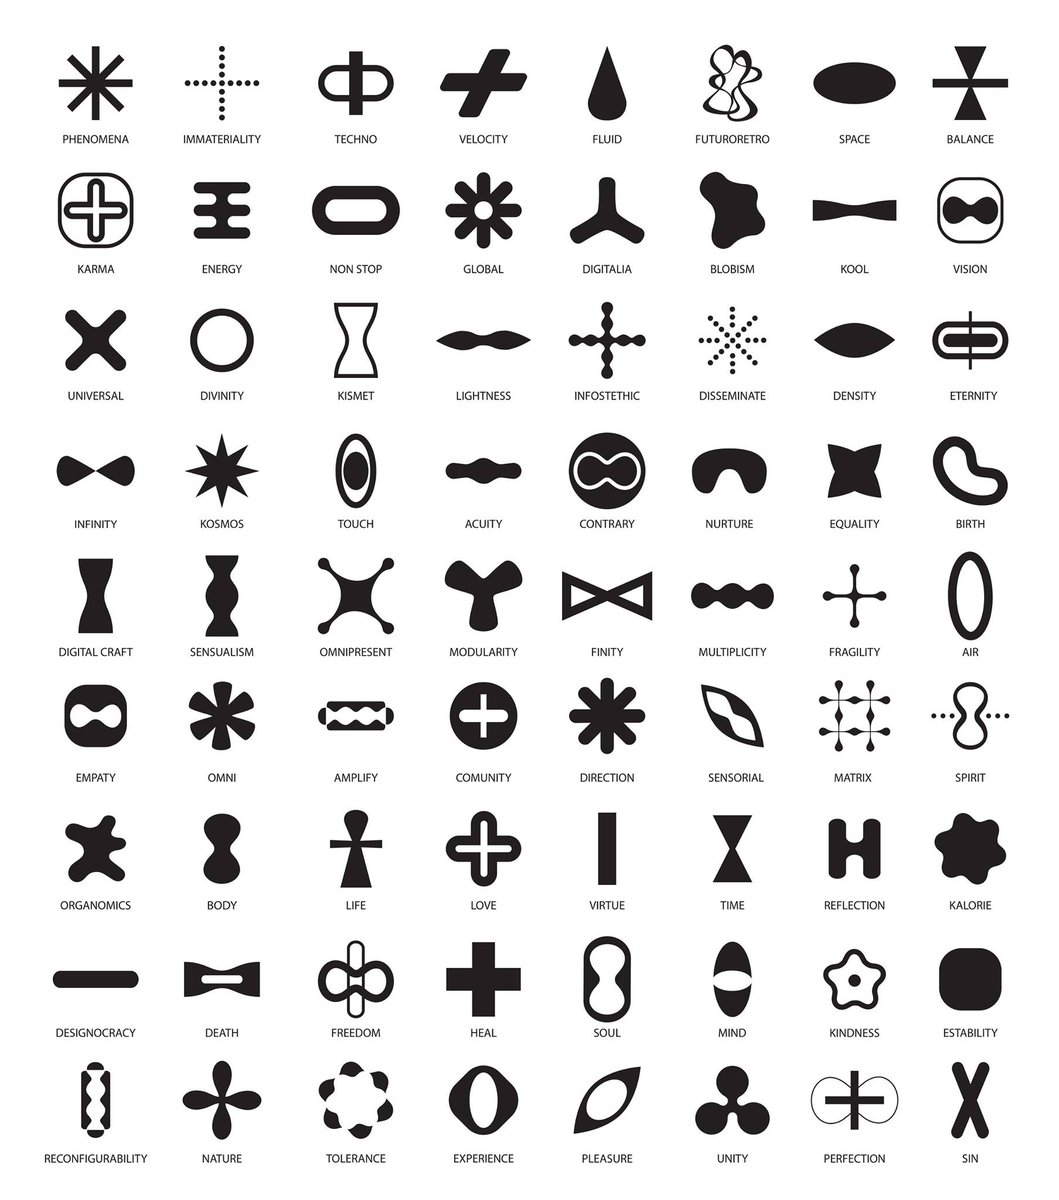 Karim Rashid On Twitter My Symbols Of Life Httptw8wm008tvk